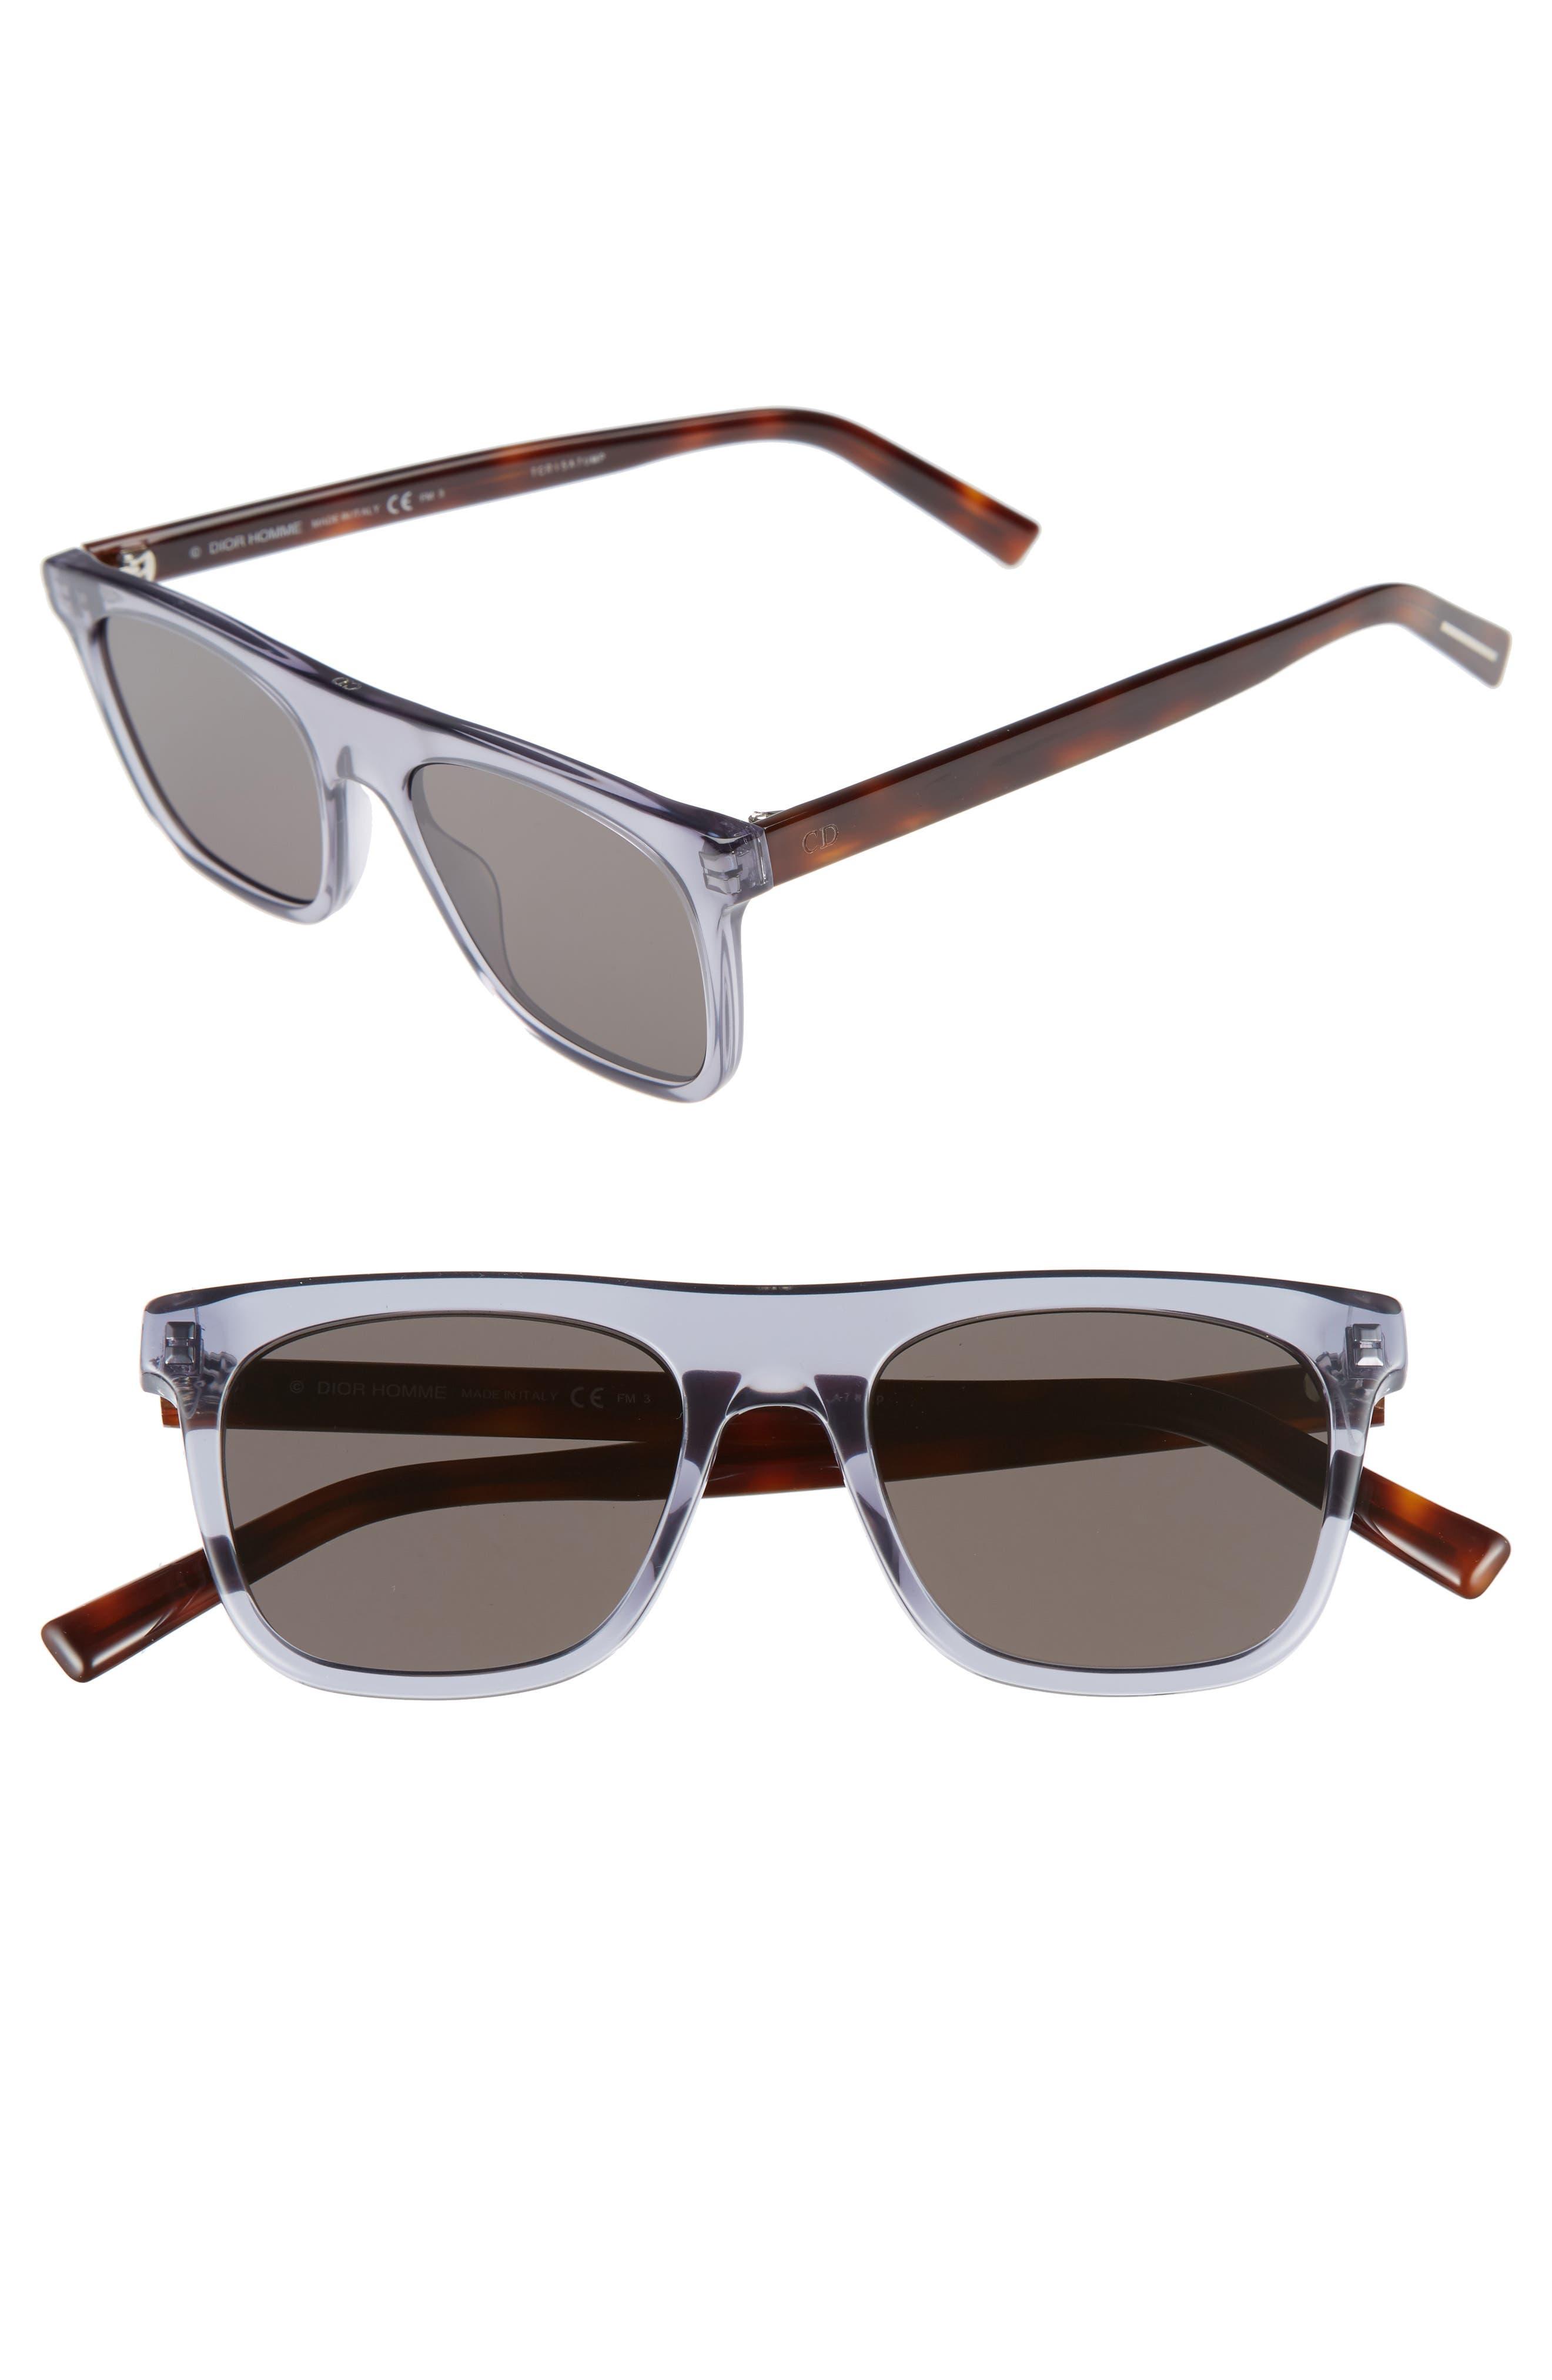 Main Image - Dior Homme Walk 51mm Sunglasses